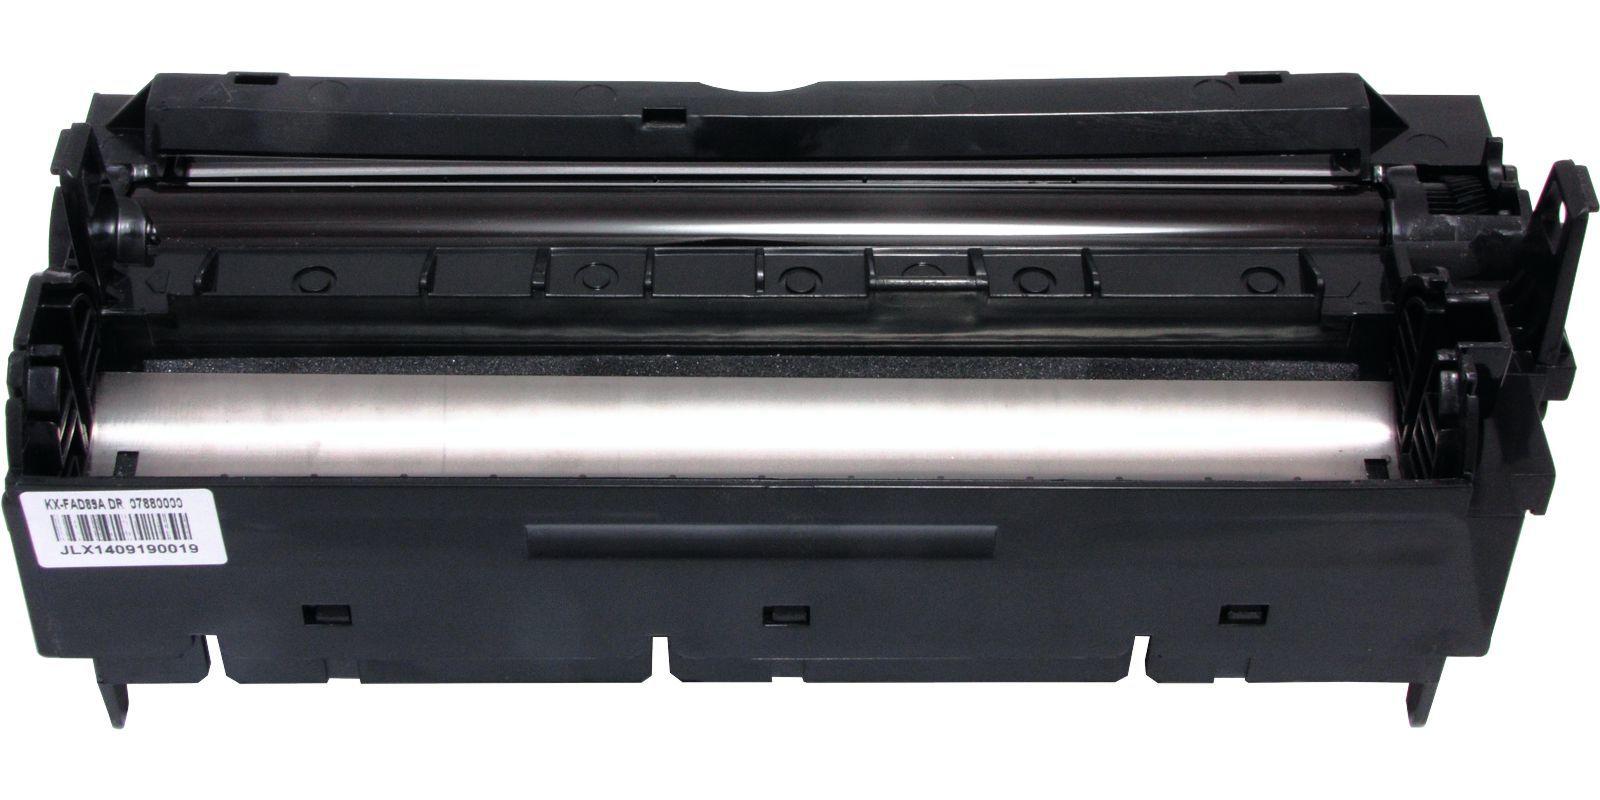 Panasonic MAK KX-FAD89A, черный, DRUM Unit, до 10000 стр.